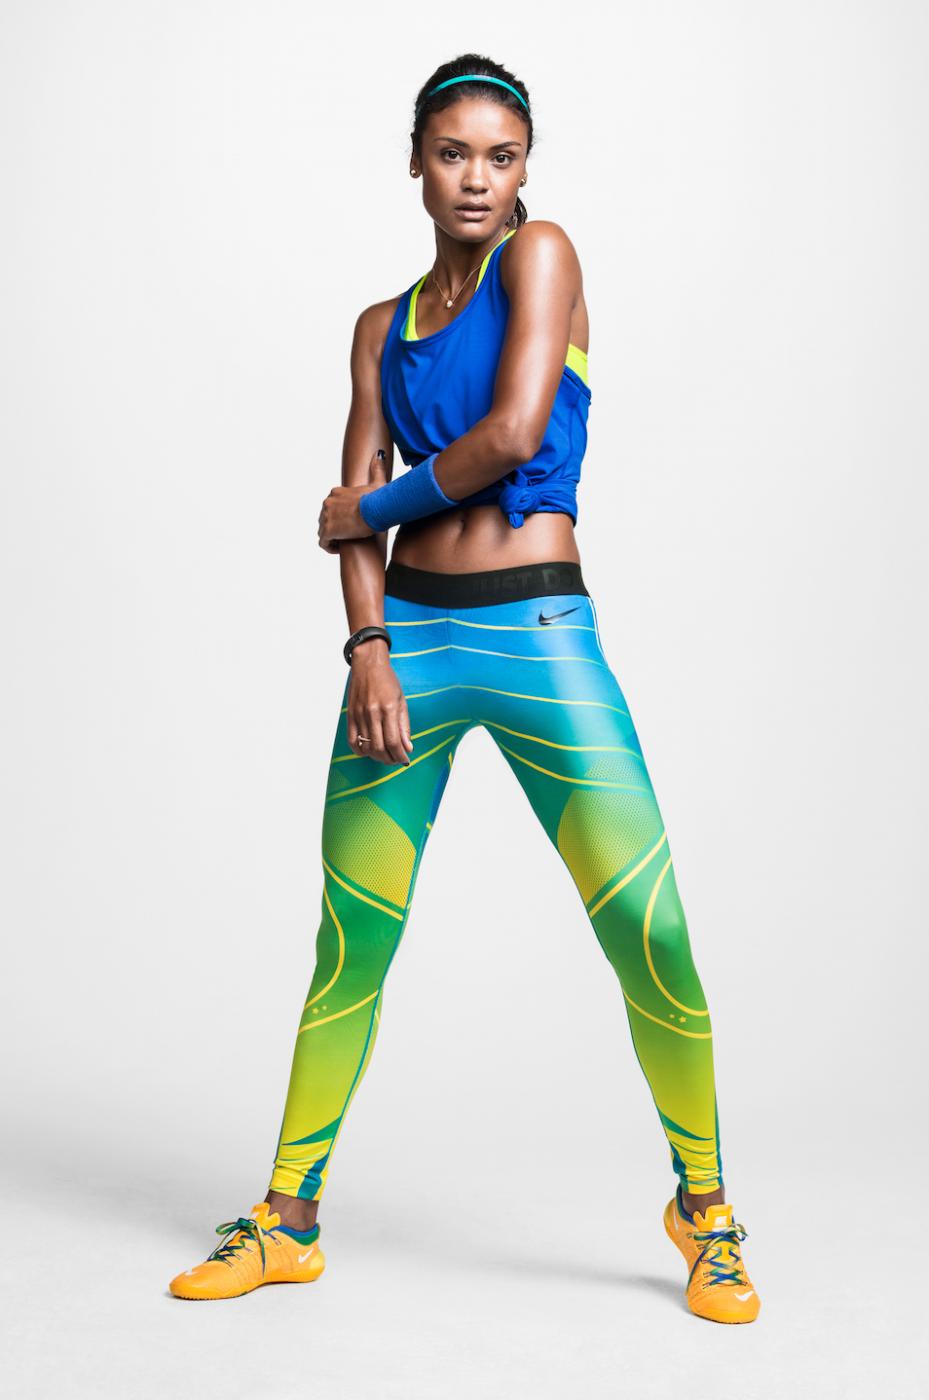 Nike NTM_x_Brasil